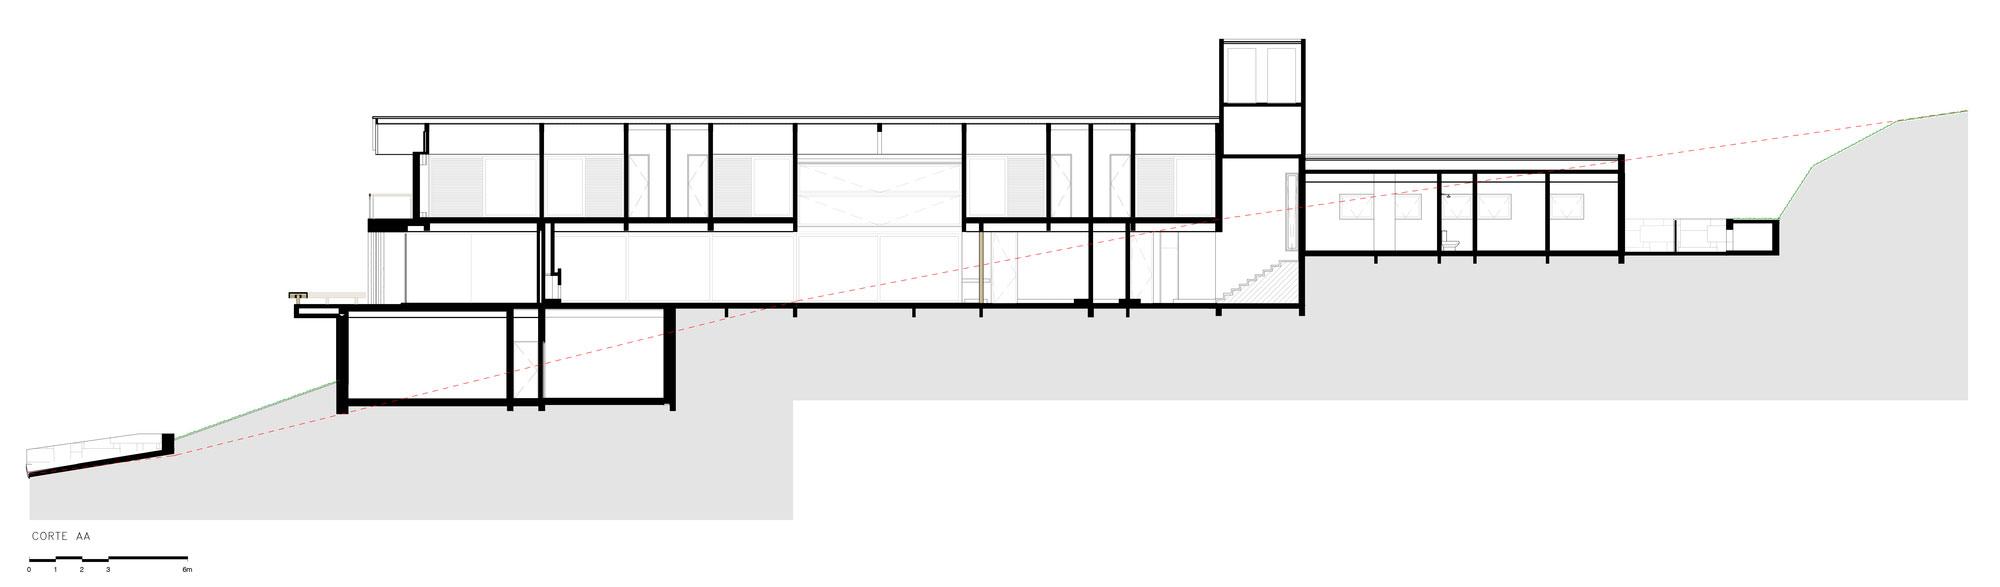 FT Modern Holiday and Weekend House by Reinach Mendonça Arquitetos Associados-23